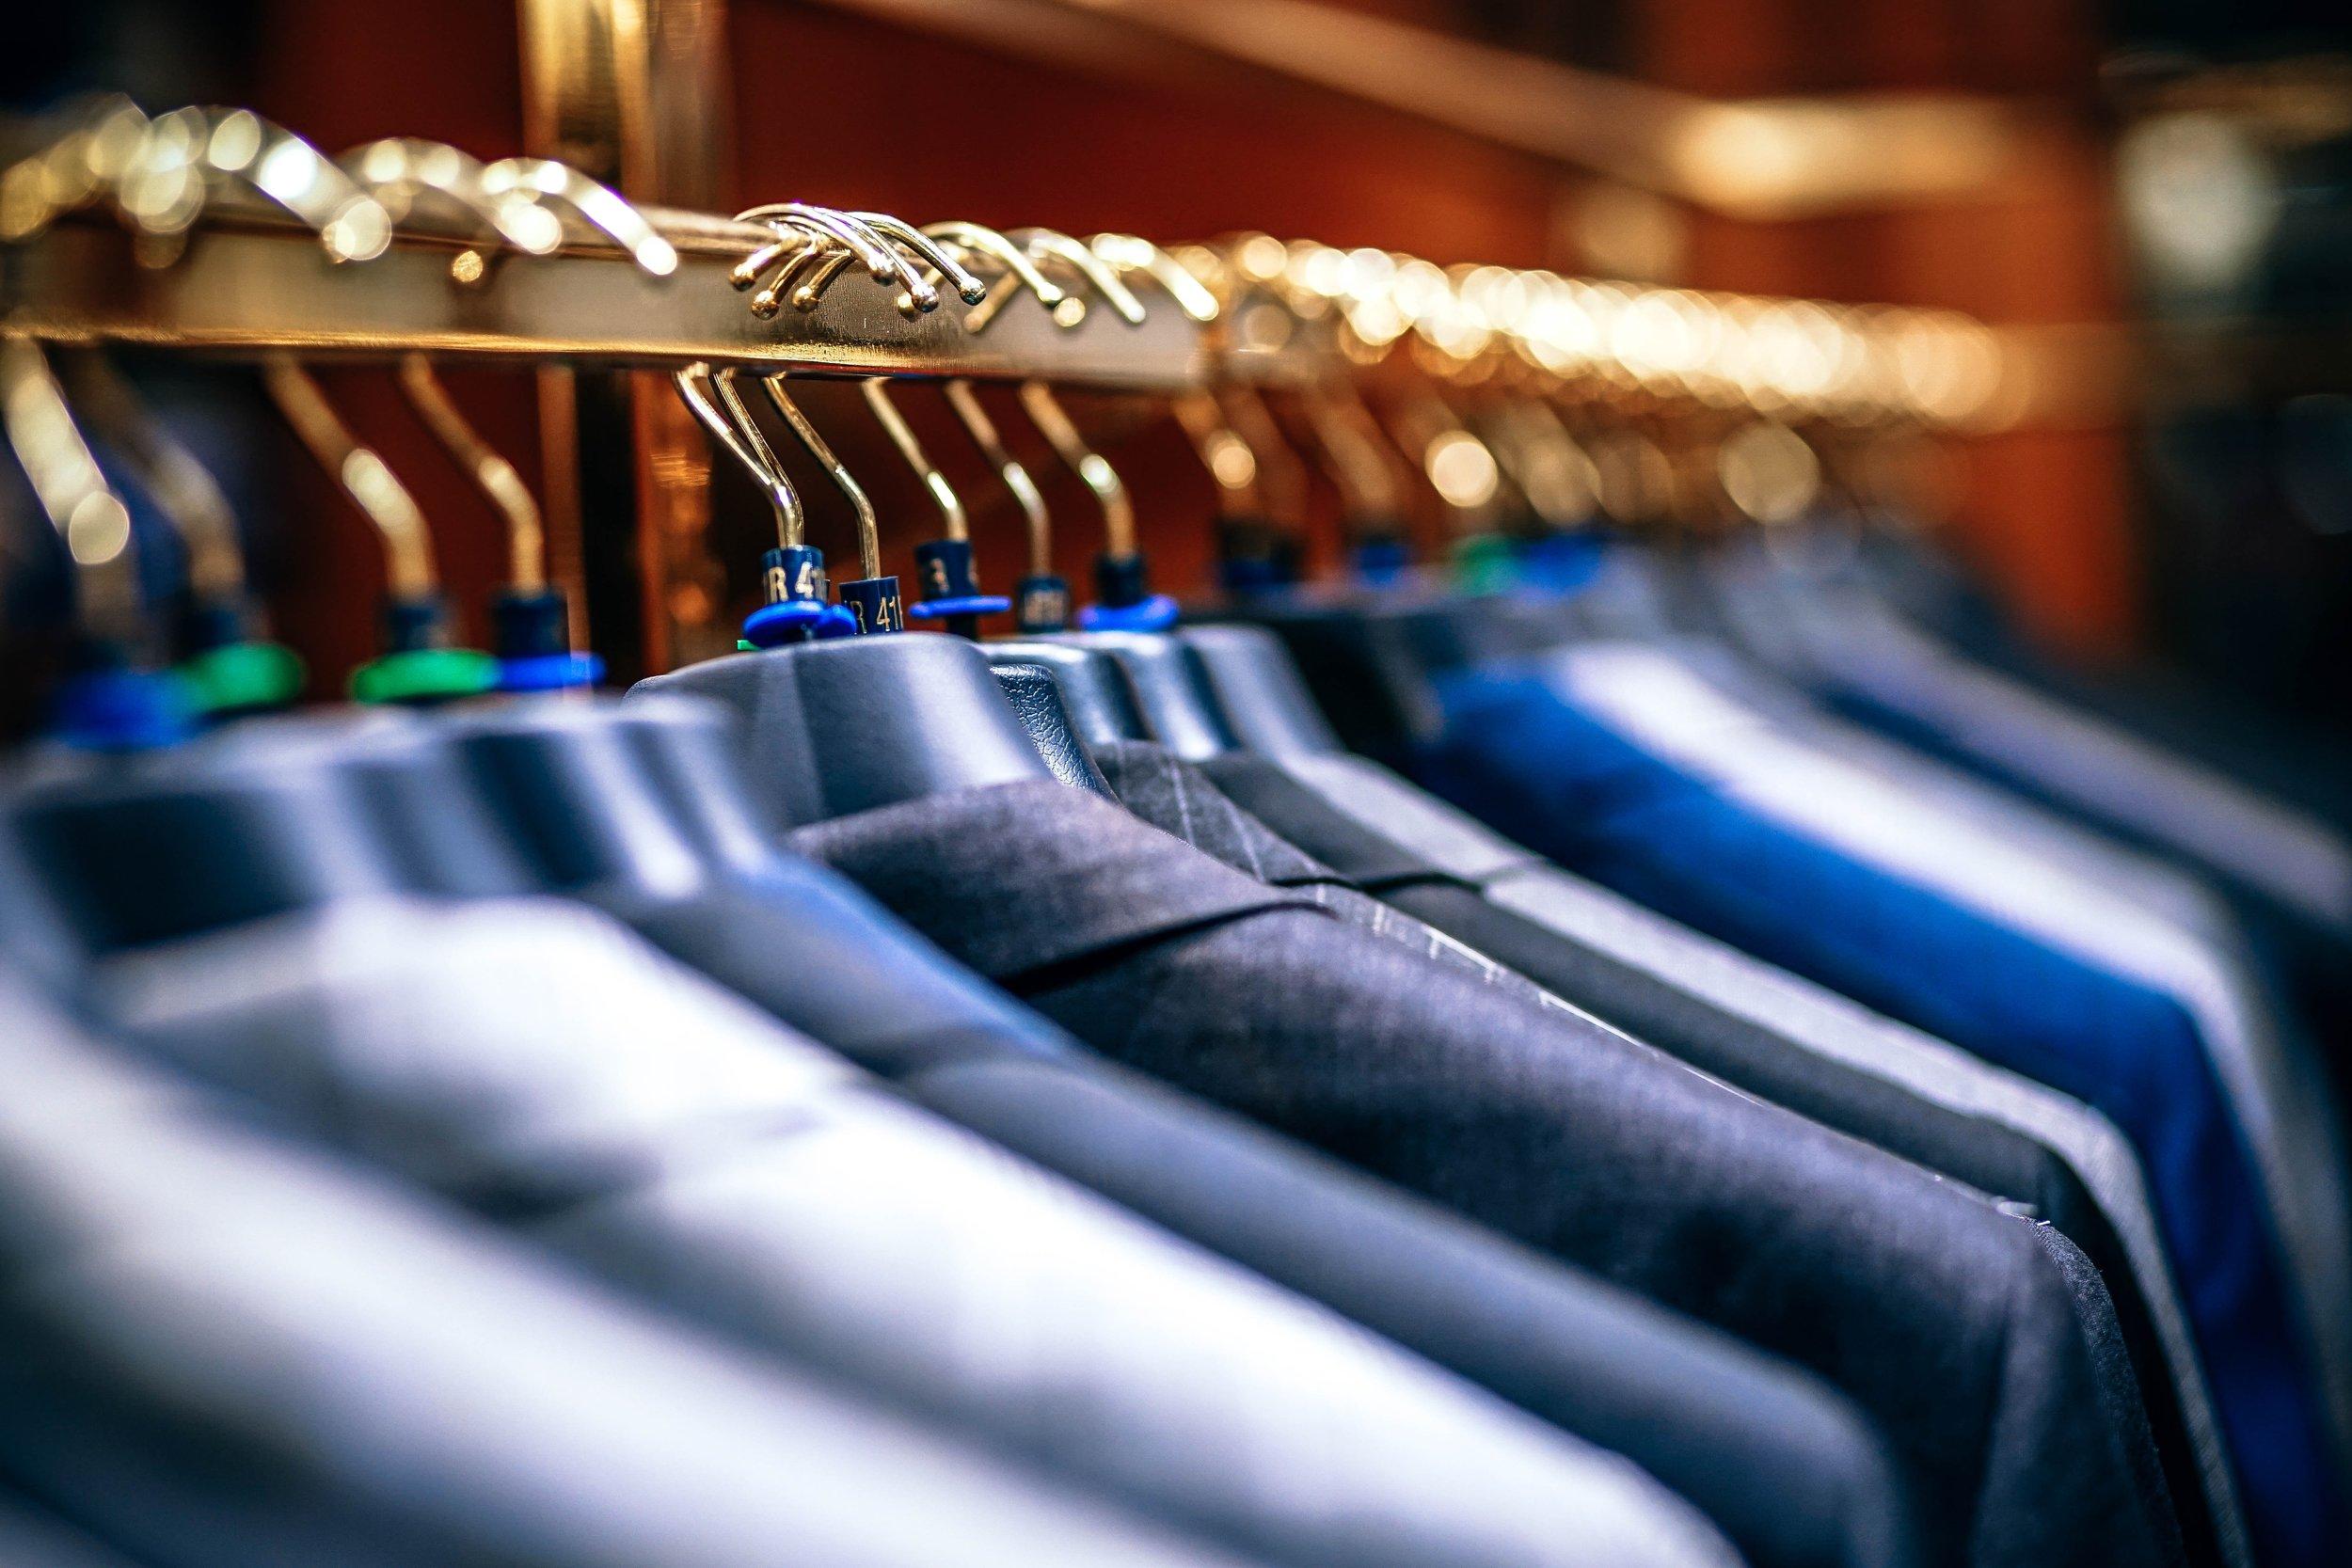 blue-blur-boutique-404174.jpg